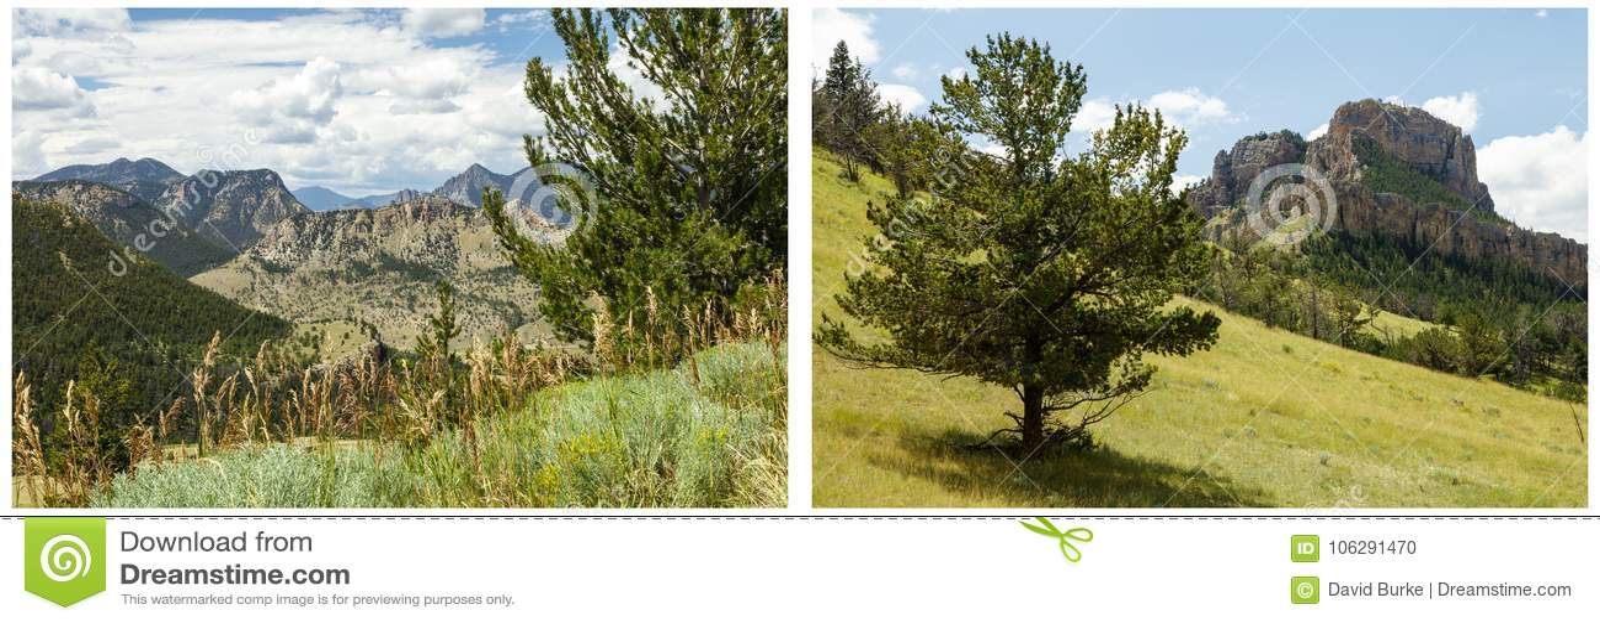 Ponderosa Pine Tree Meadow Grass Hillside Collage Stock ...